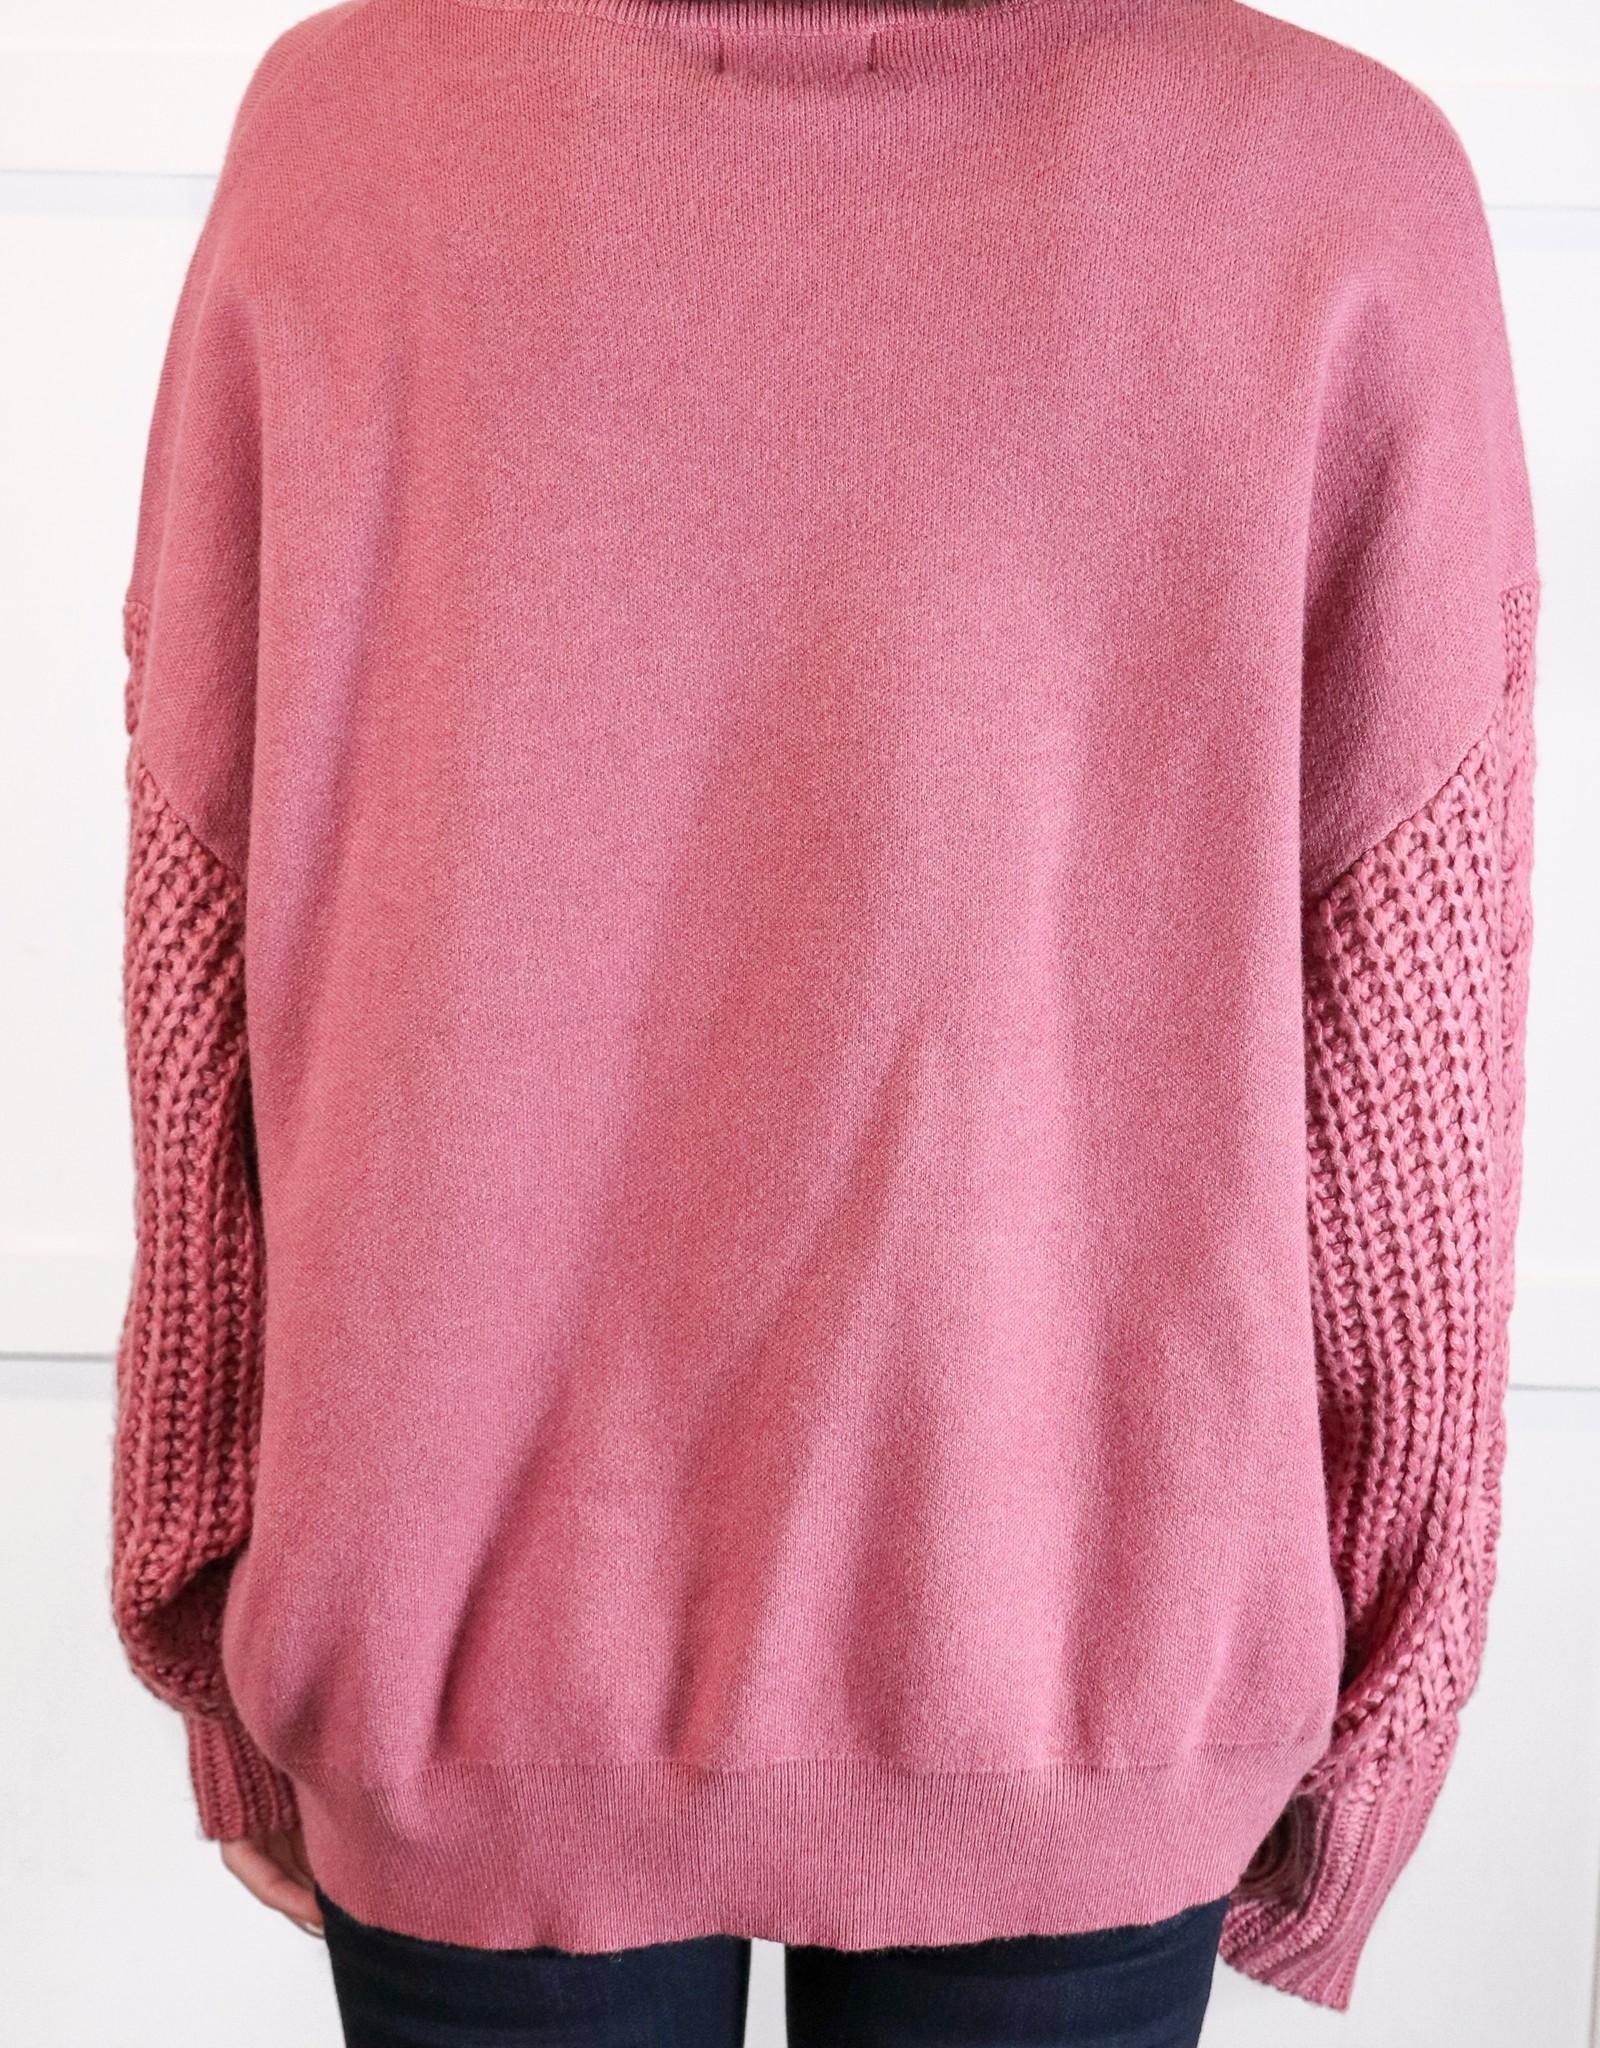 HUSH Crewneck w/ cable knit slv